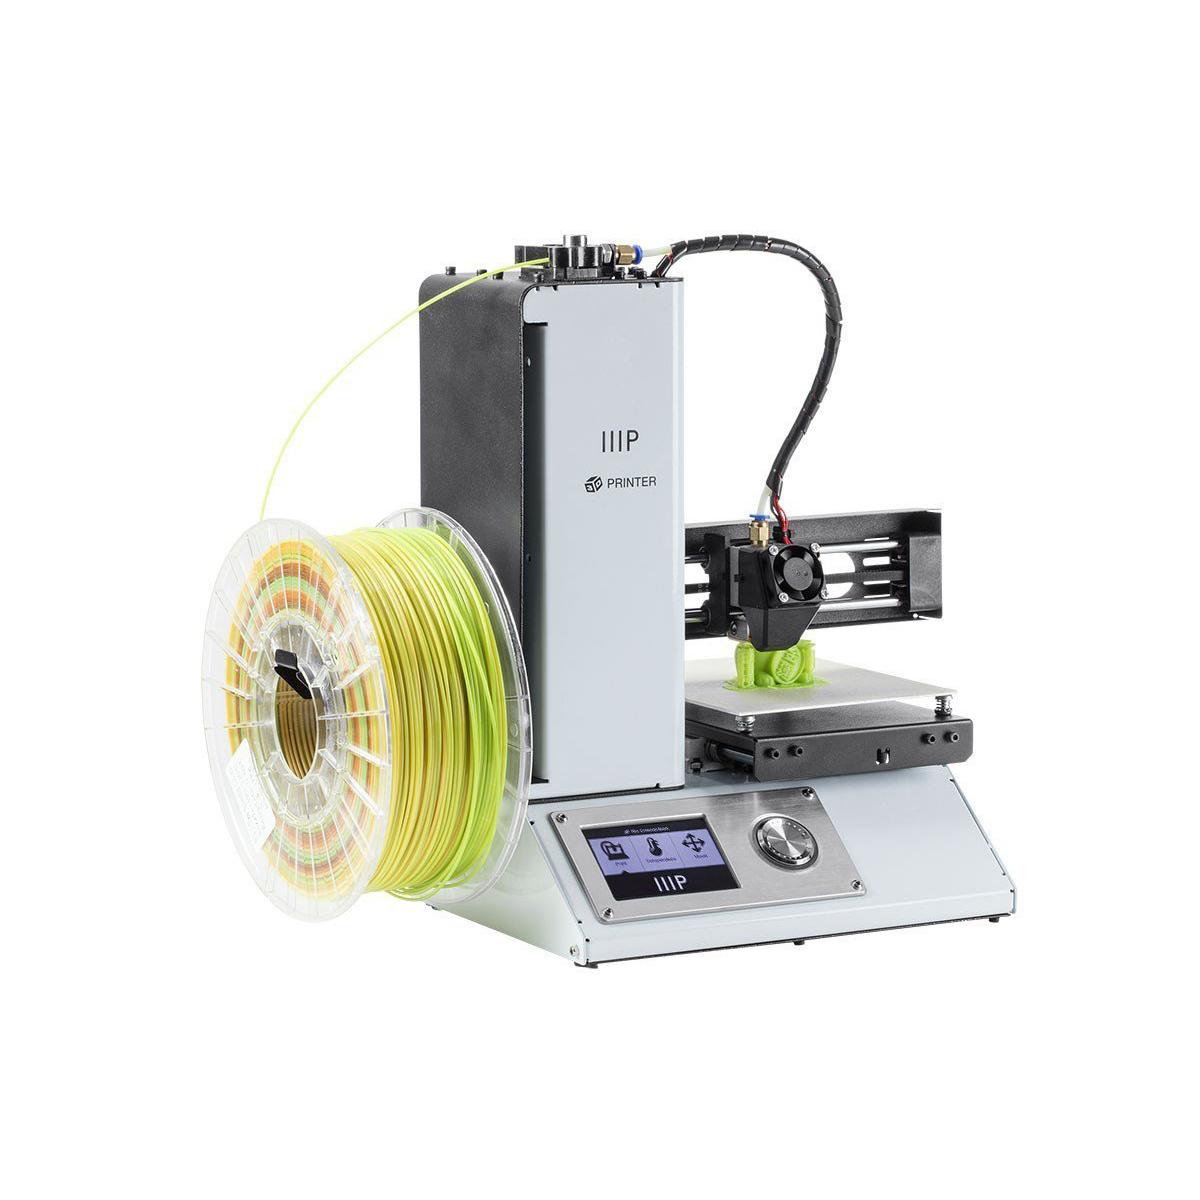 Monoprice maker select mini